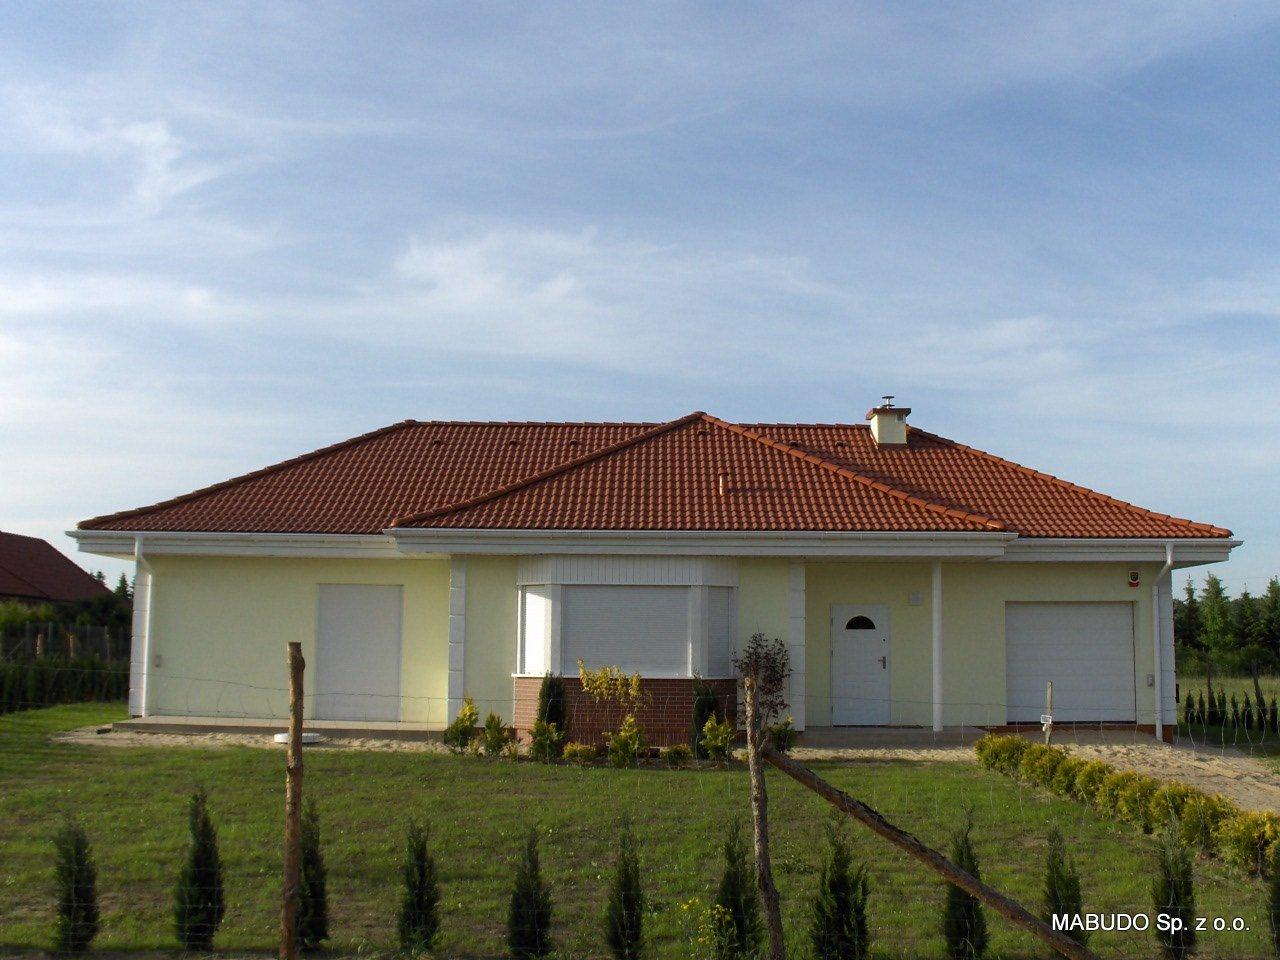 projekt-domu-kujawiak-fot-1-1374154056-vjbjnpuj.jpg